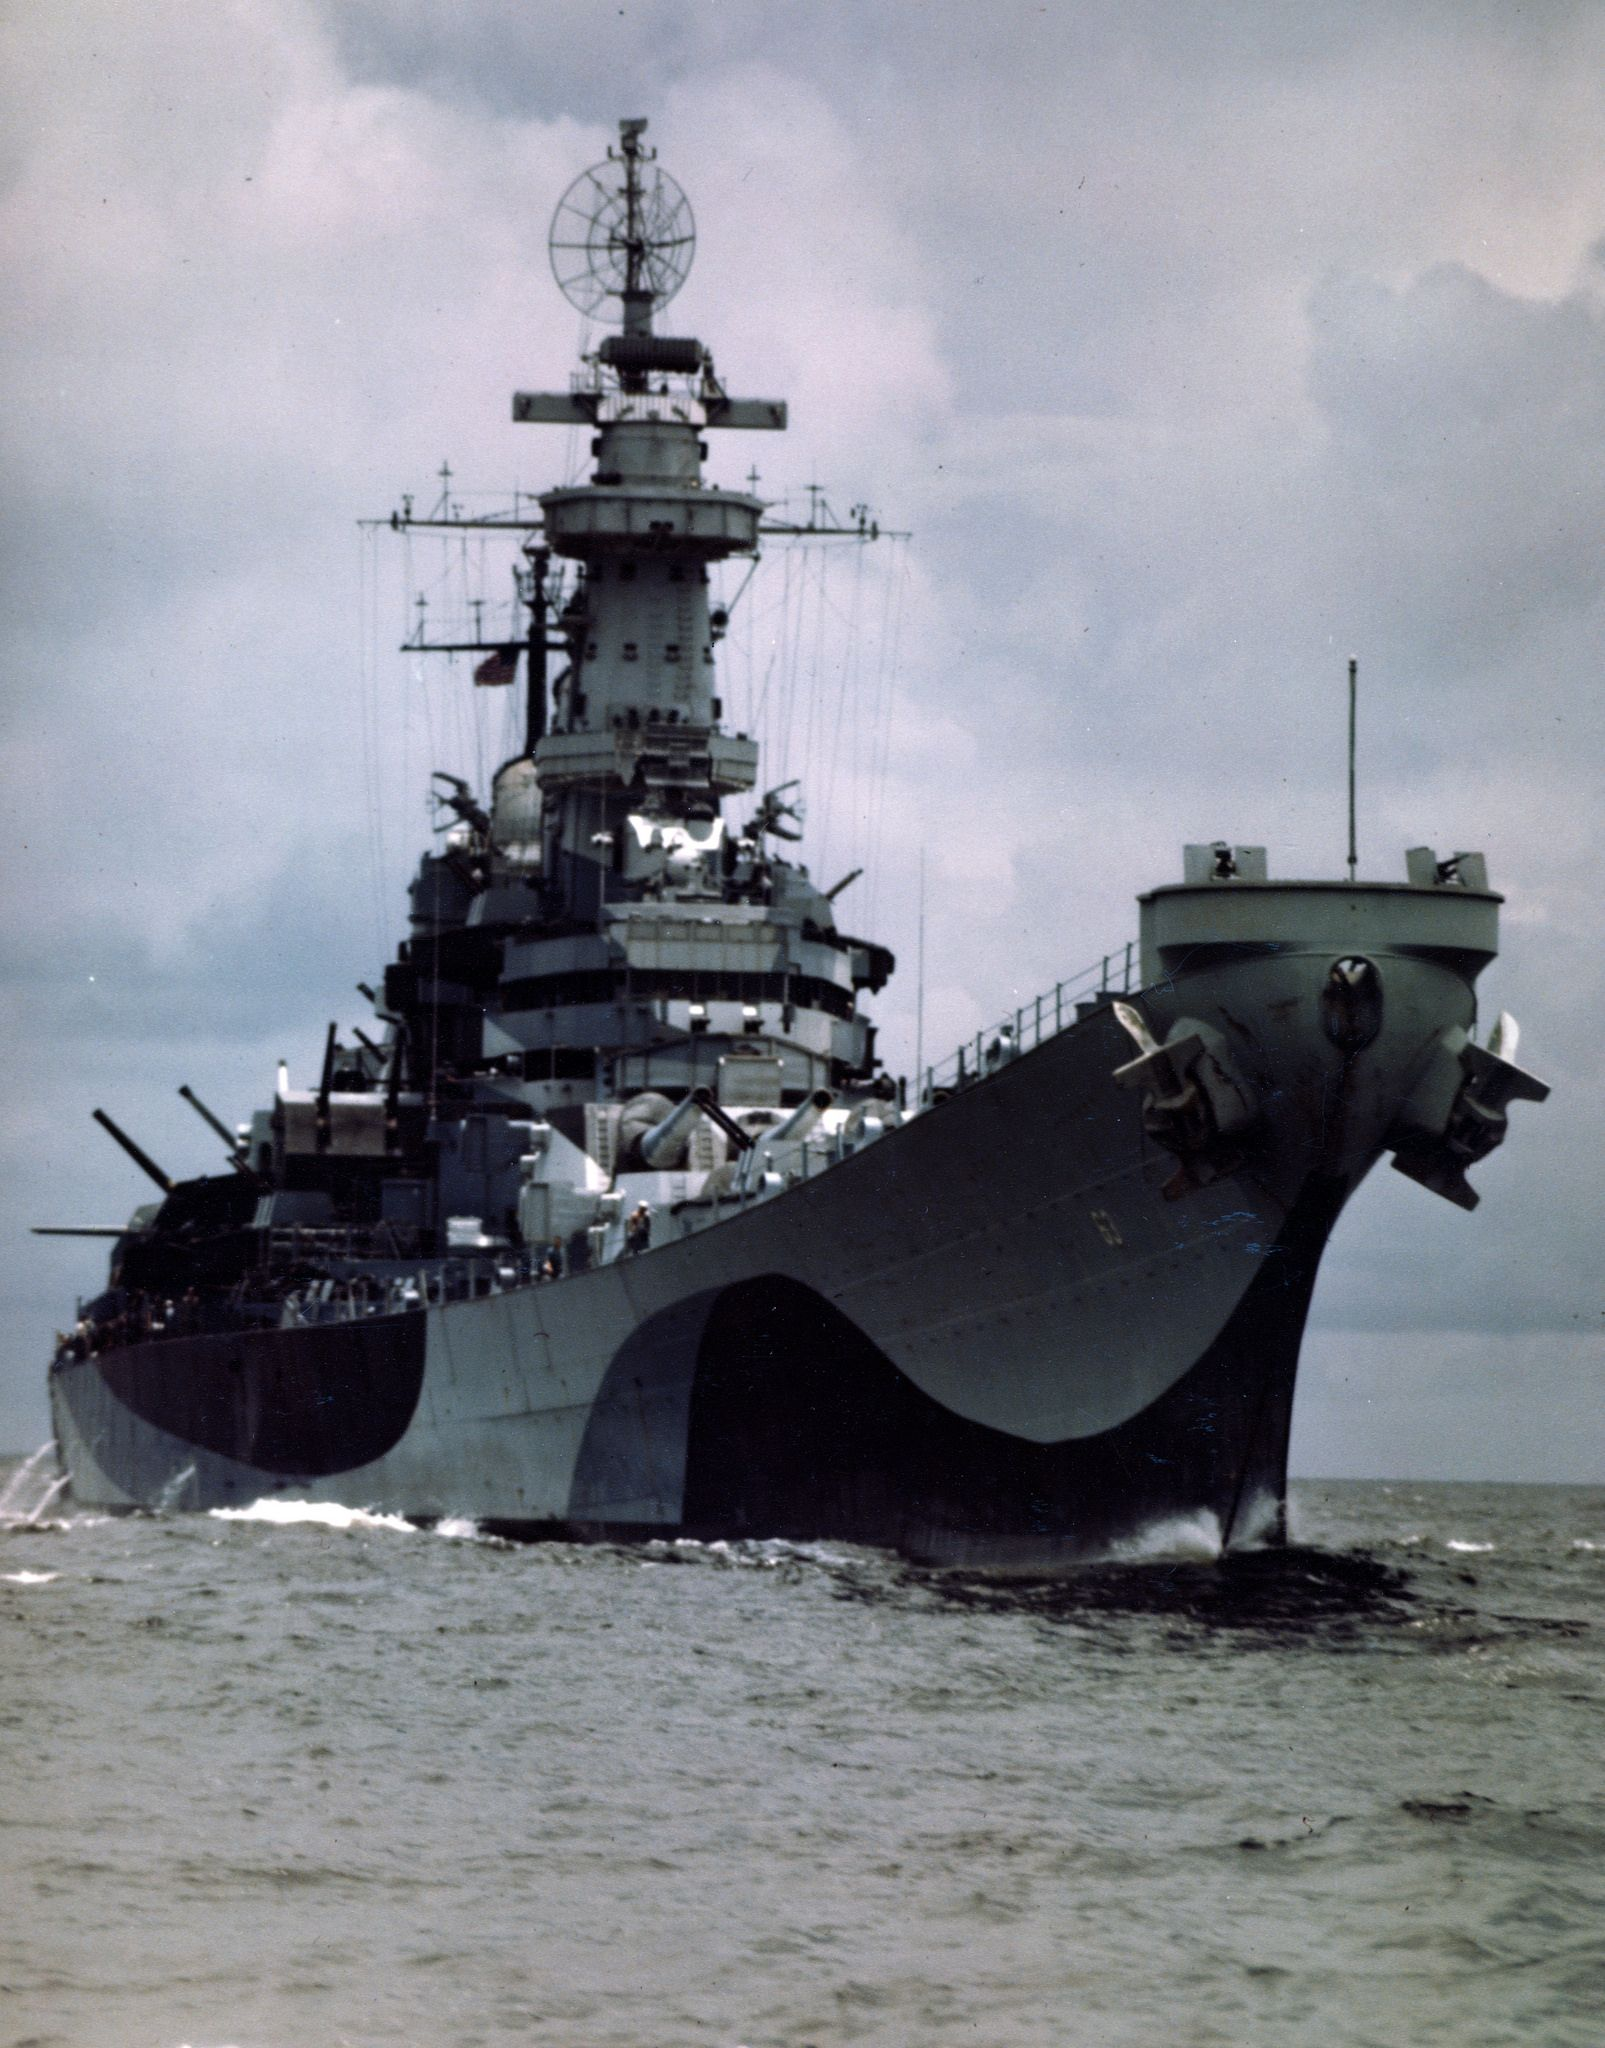 80 g k 4575 u s navy battleship, navy ships, capital ship